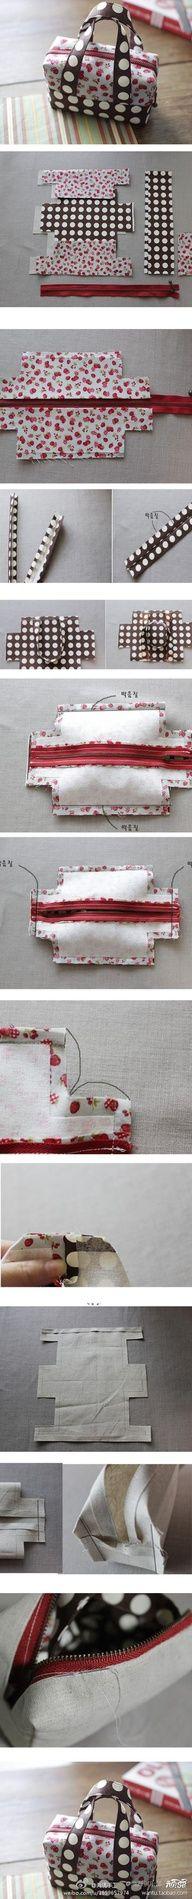 Scripture case DIY !! Different fabric.. Perfect Divine Nature Project!!! :)